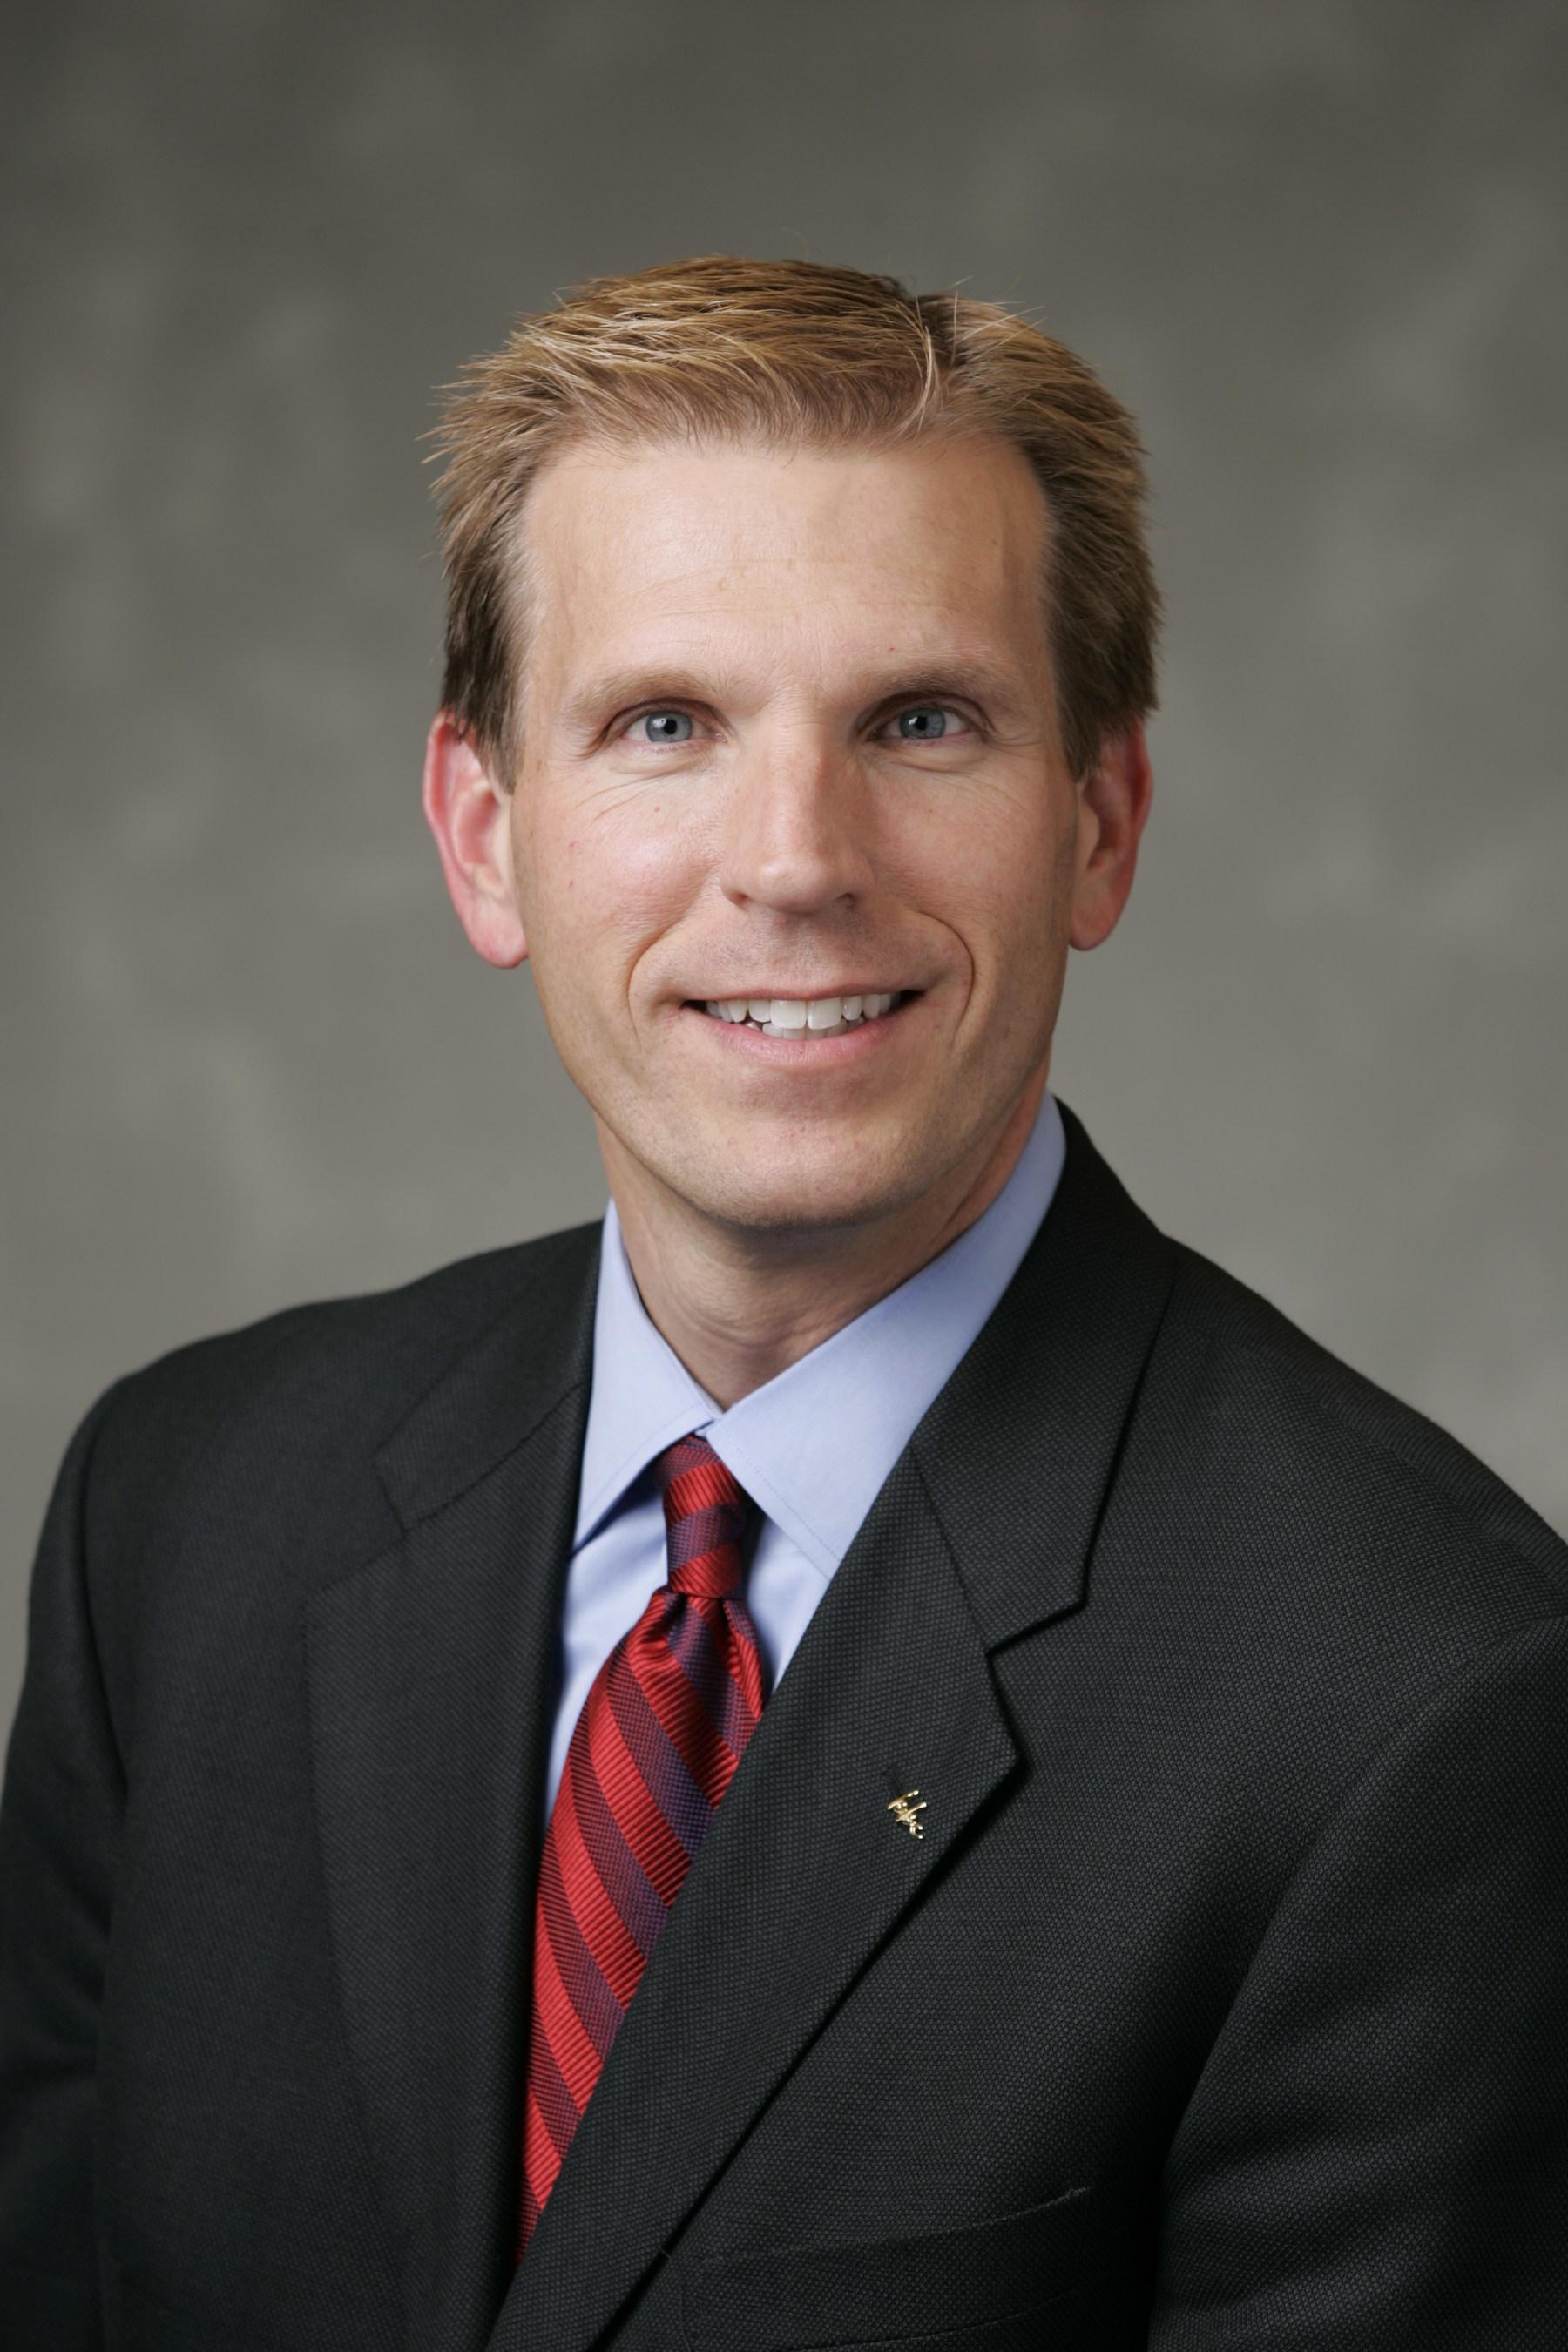 David Trexler, Senior Vice President of Oncology Commercial